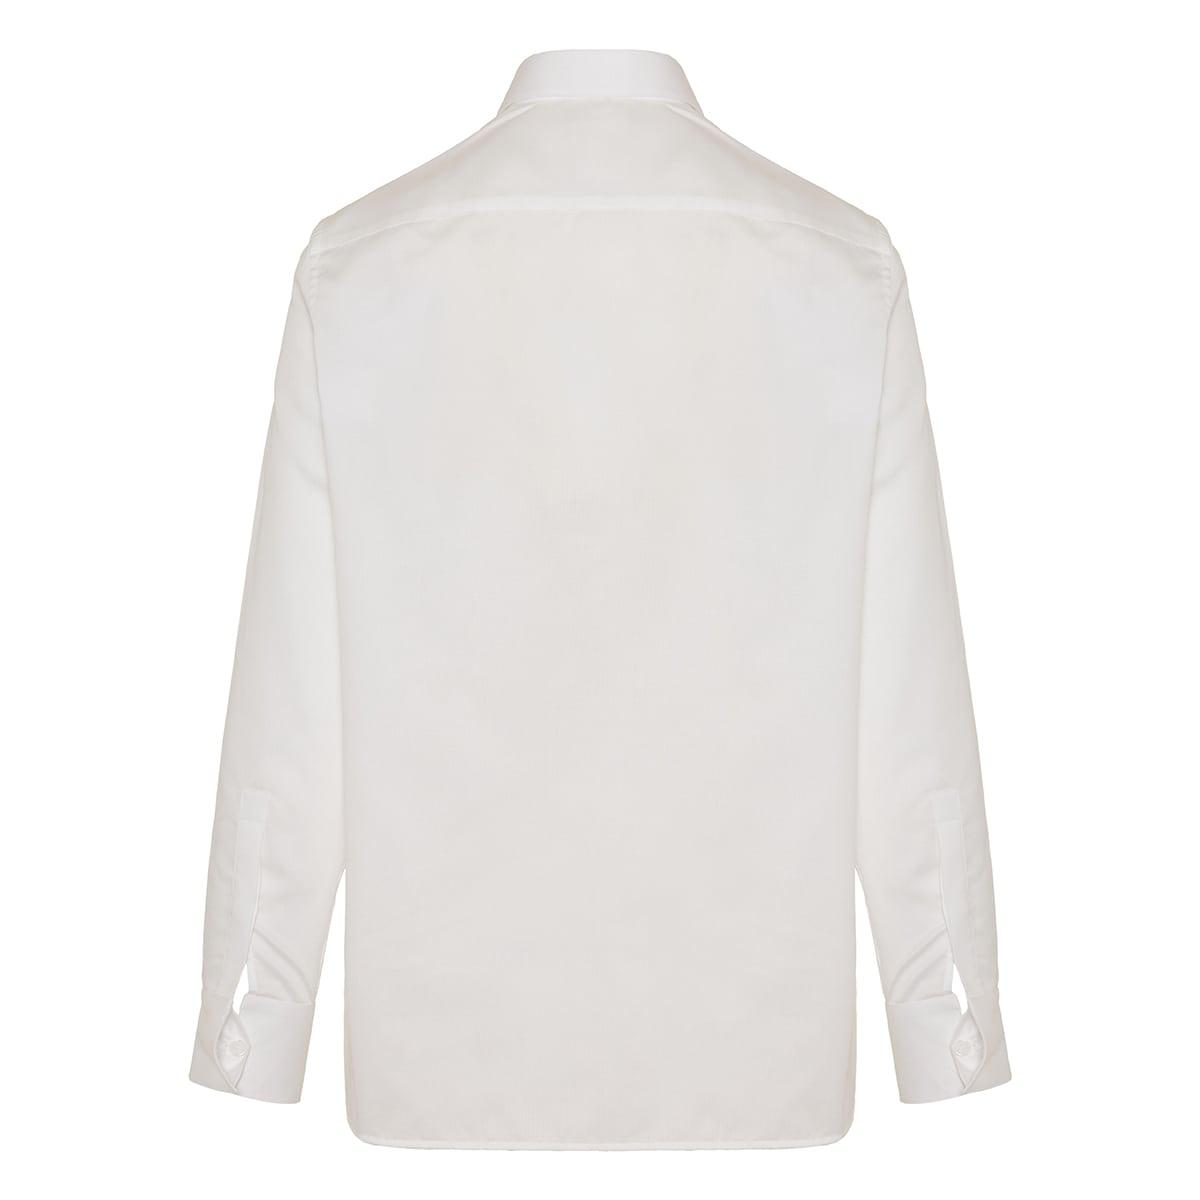 Metal-detailed poplin shirt